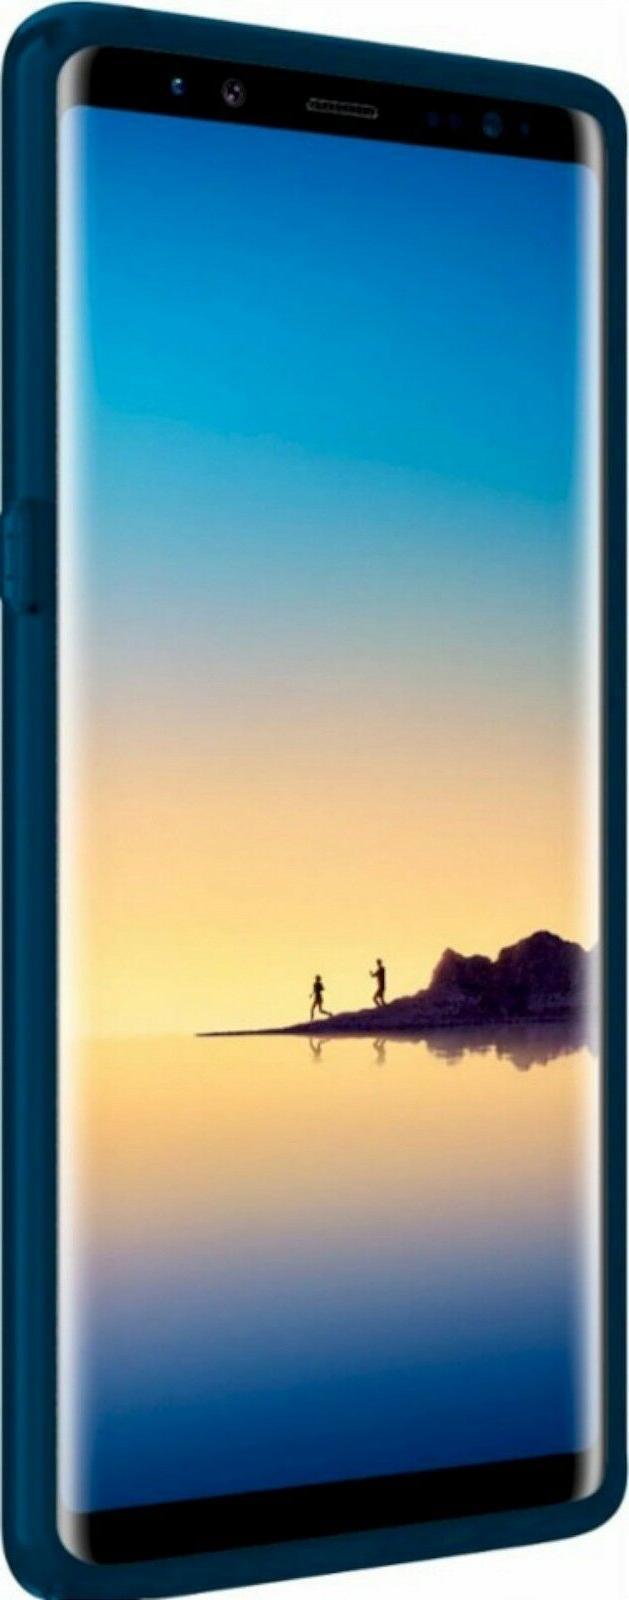 NEW Phone Samsung Galaxy NAVY w/Clear